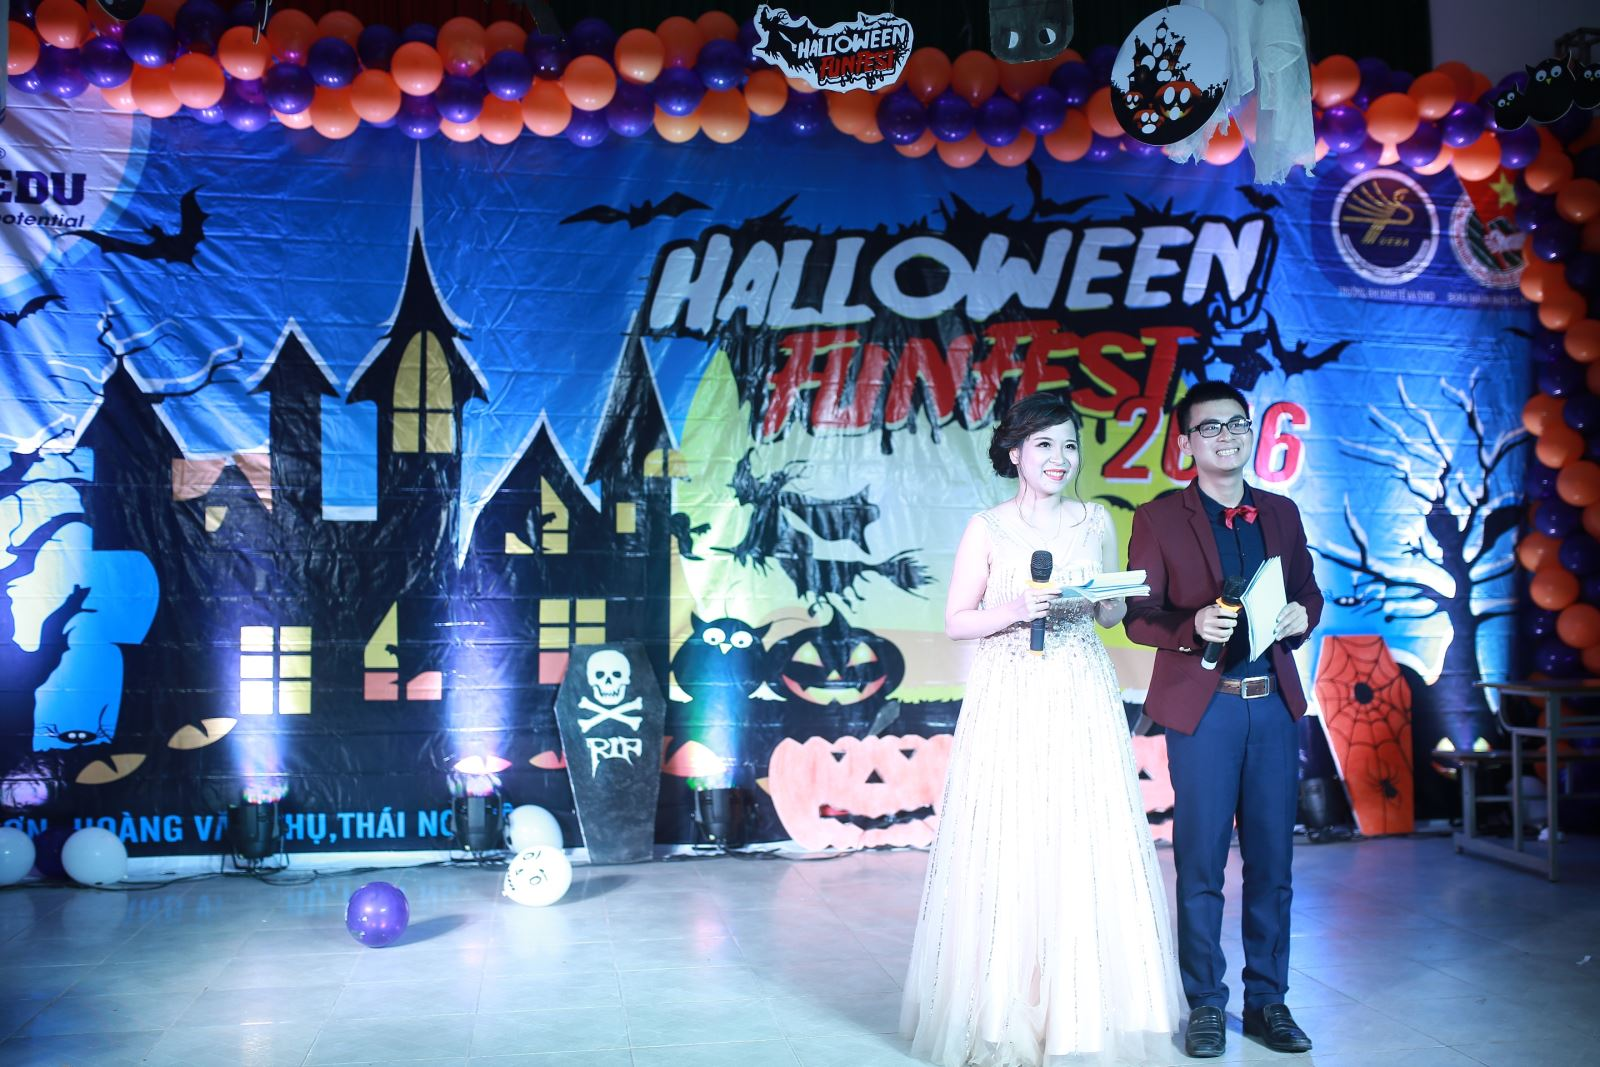 Ocean Edu Thai Nguyen Halloween